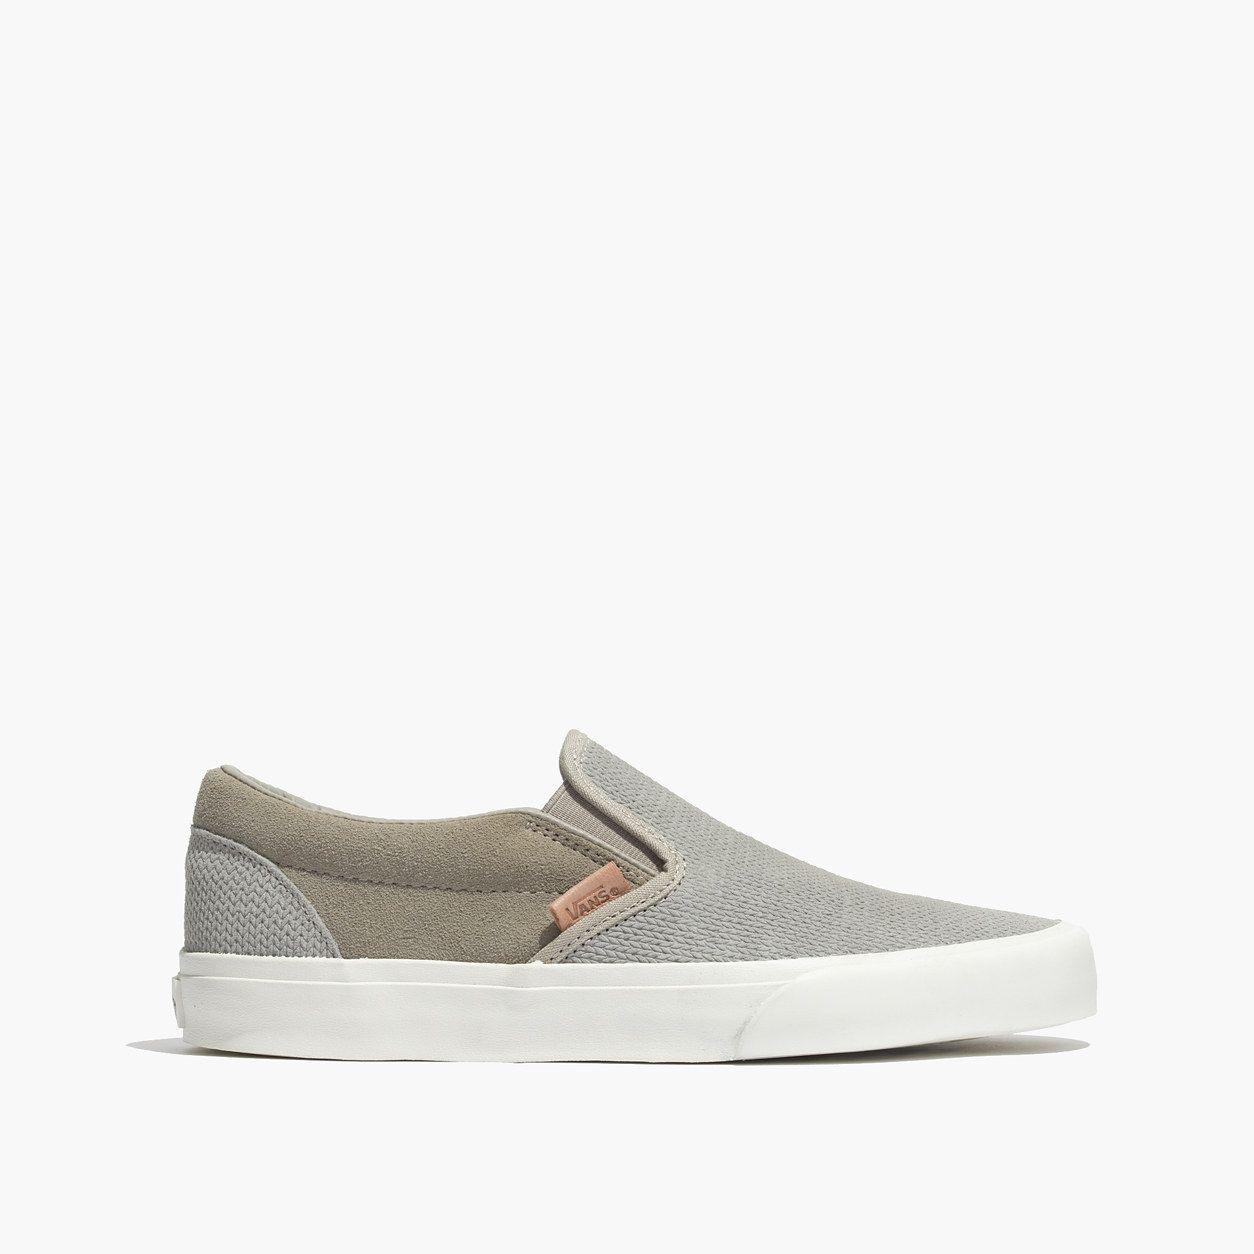 wide varieties factory outlets get online Madewell Vans Slip-On Sneakers In Textured Suede   *Shoes ...